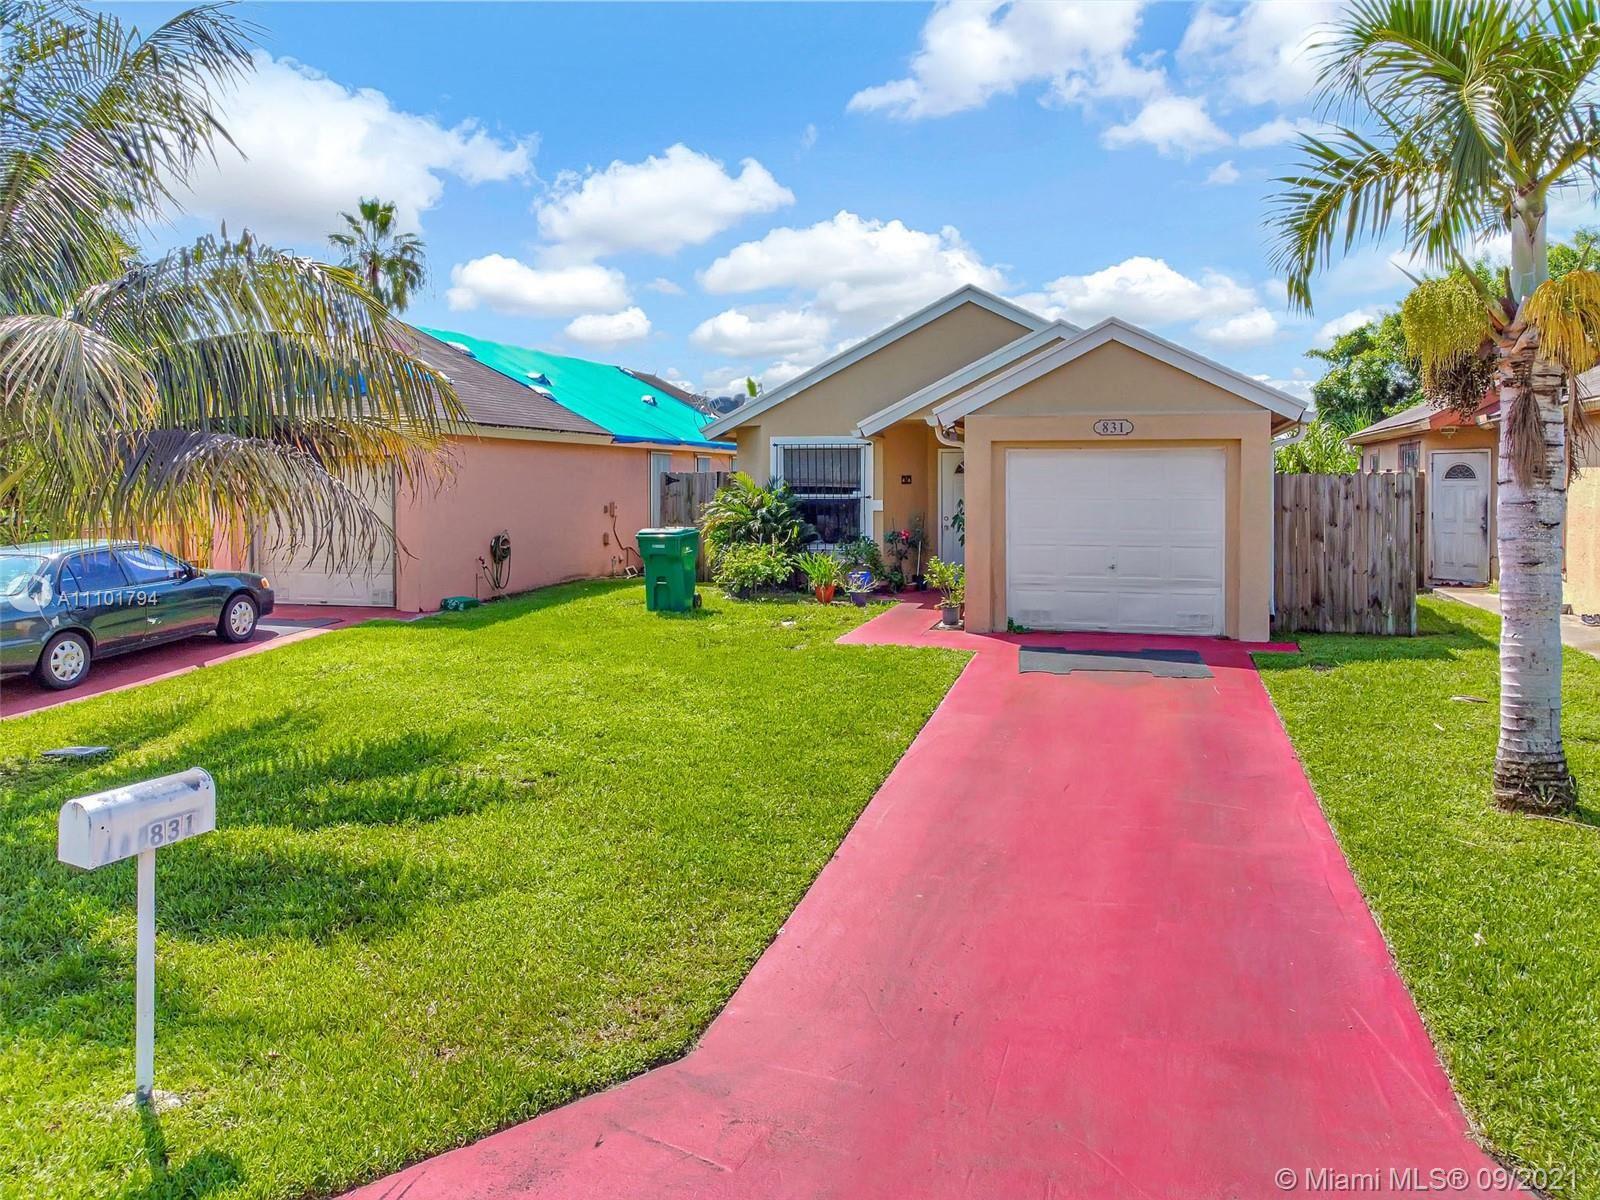 831 SW 10th St, Florida City, FL 33034 - #: A11101794